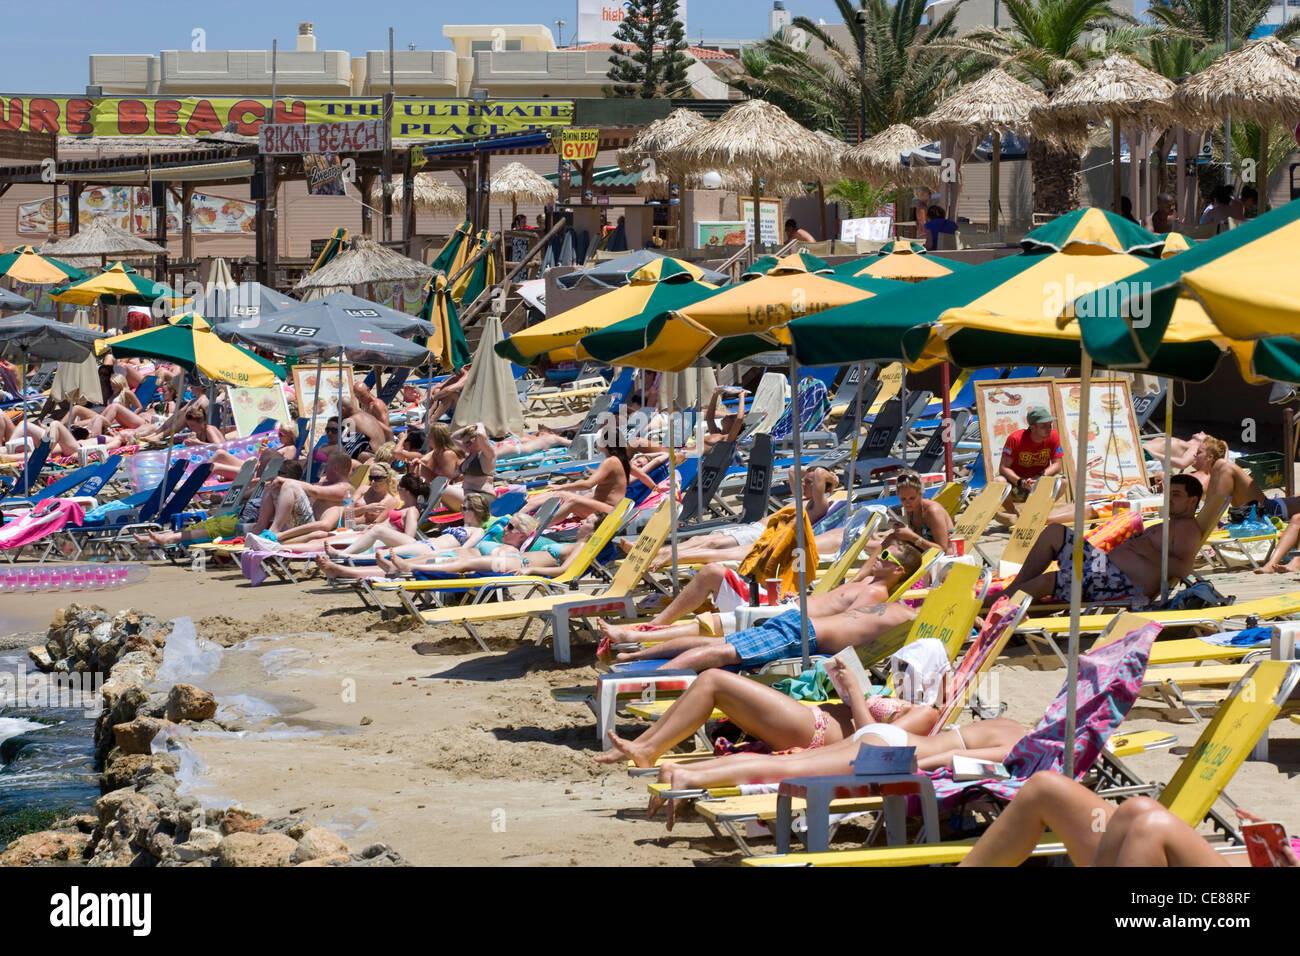 Crete: Malia resort beach - Stock Image